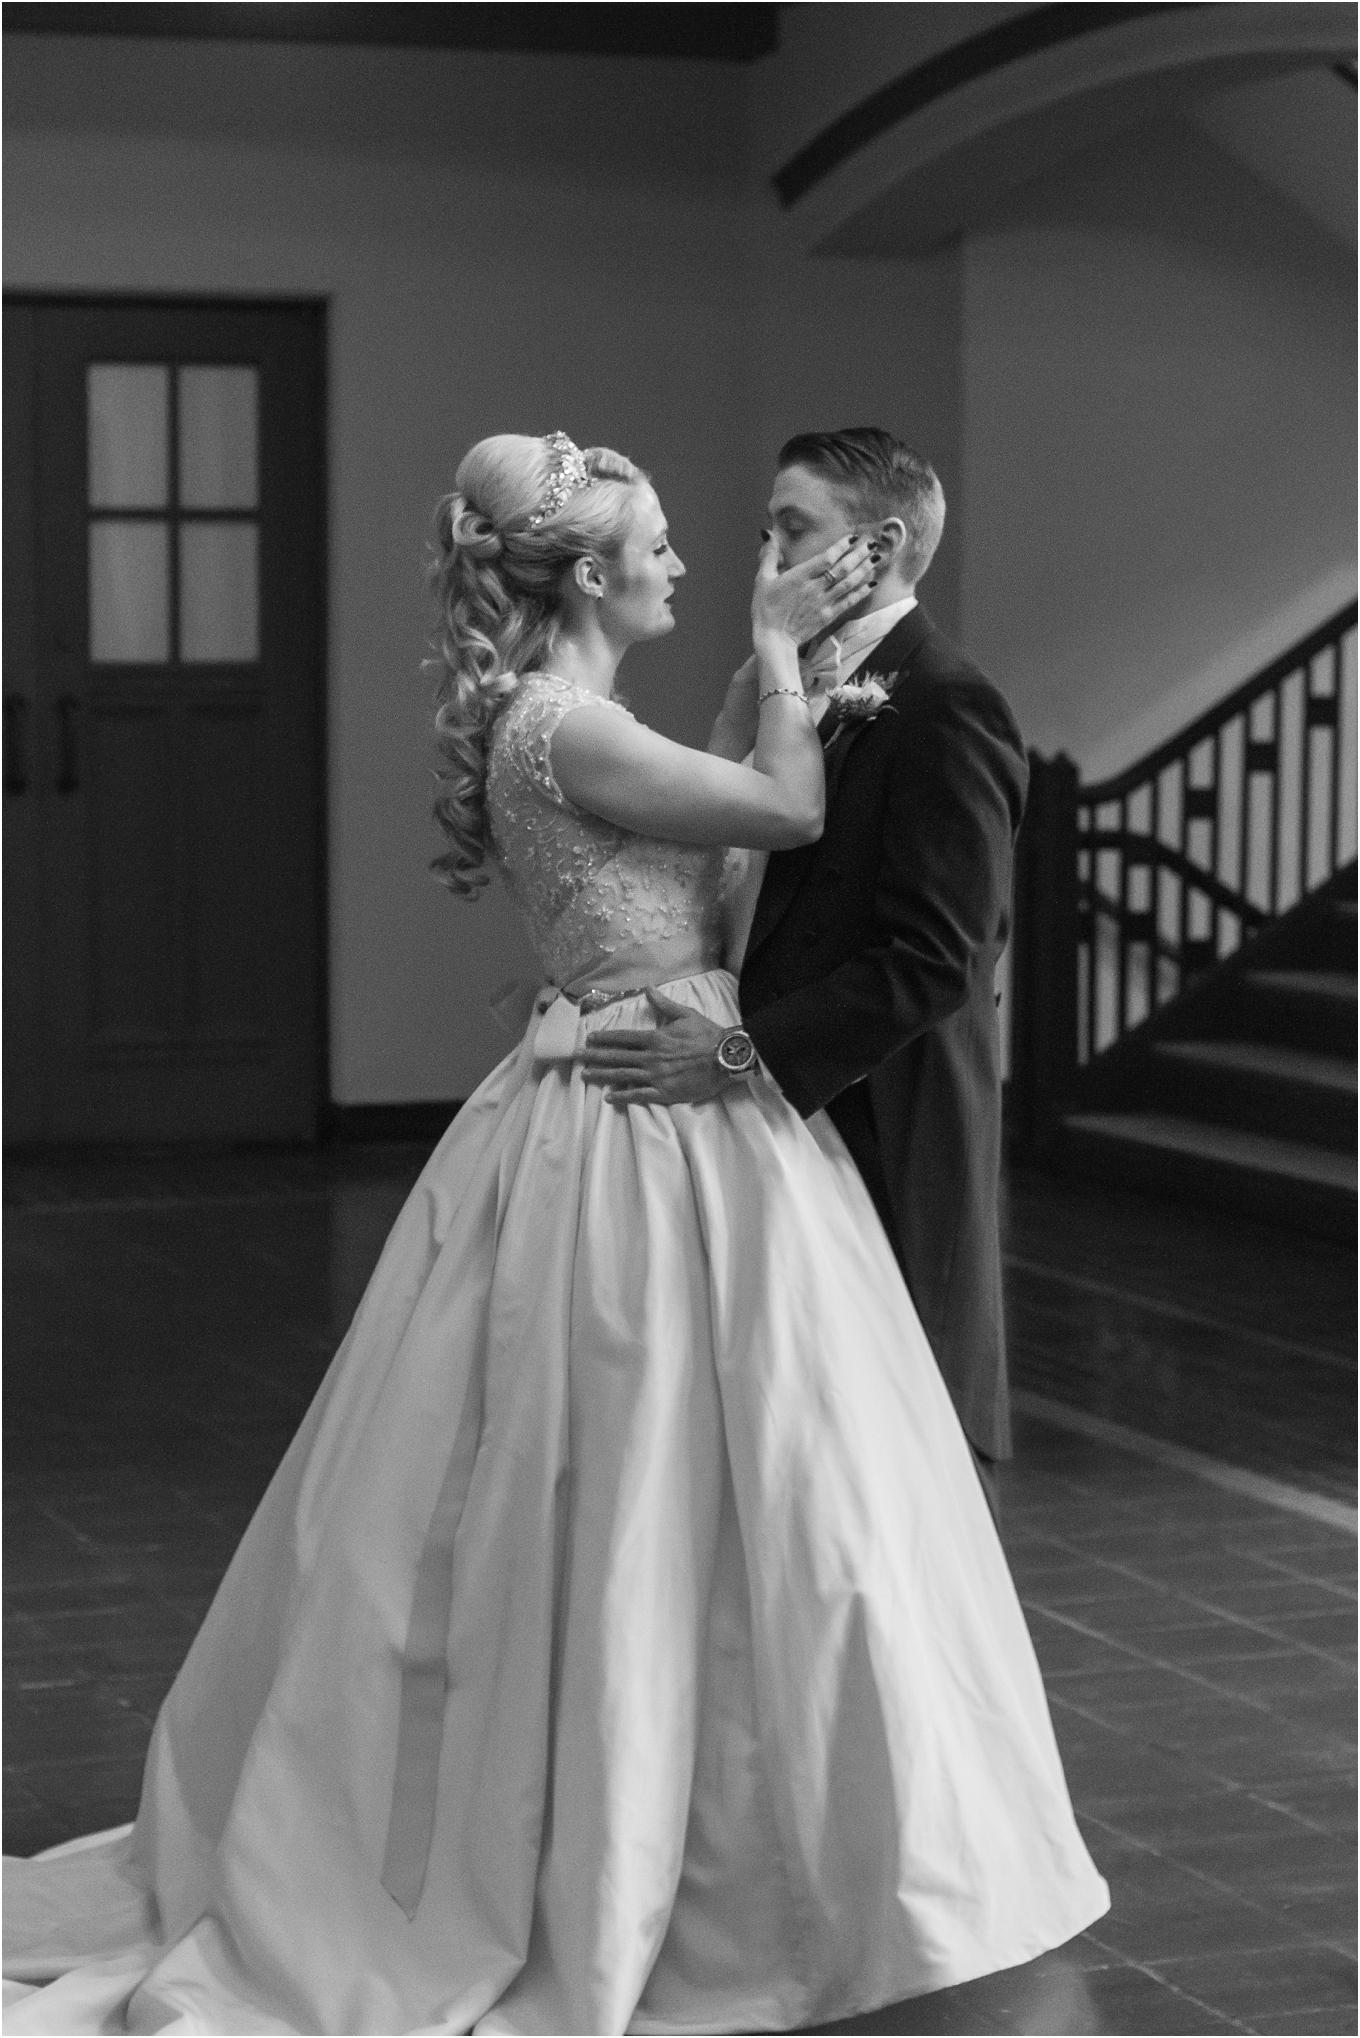 elegant-classic-fairytale-wedding-photos-in-detroit-mi-at-the-masonic-temple-by-courtney-carolyn-photography_0047.jpg